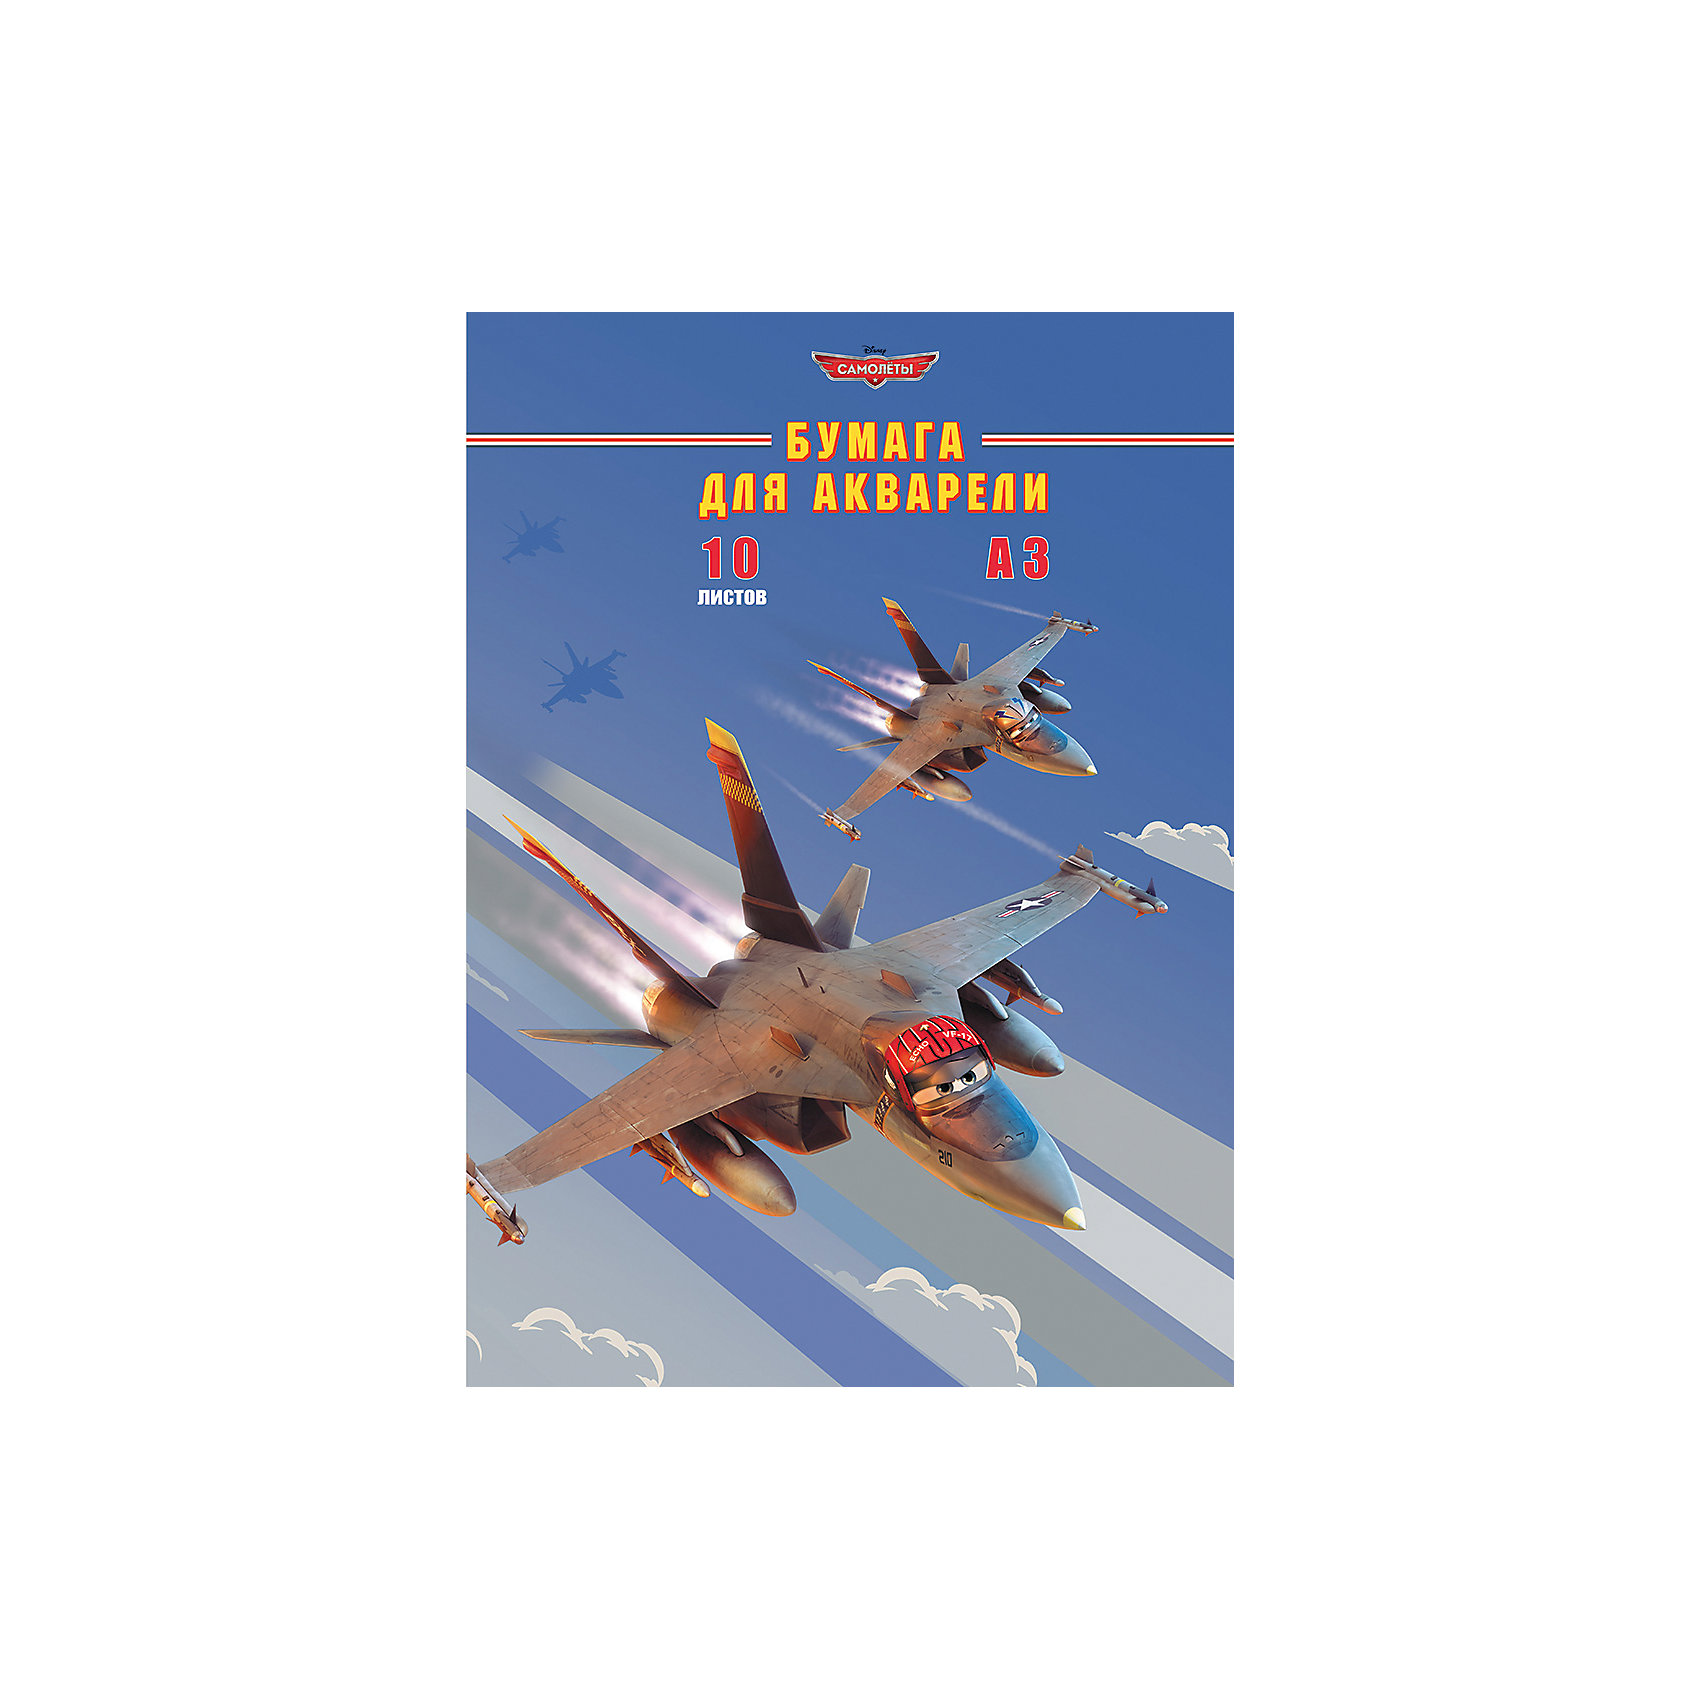 Бумага для акварели Flying Planes, А3, 10 л.Бумажная продукция<br><br><br>Ширина мм: 300<br>Глубина мм: 420<br>Высота мм: 5<br>Вес г: 264<br>Возраст от месяцев: 36<br>Возраст до месяцев: 2147483647<br>Пол: Мужской<br>Возраст: Детский<br>SKU: 4833205